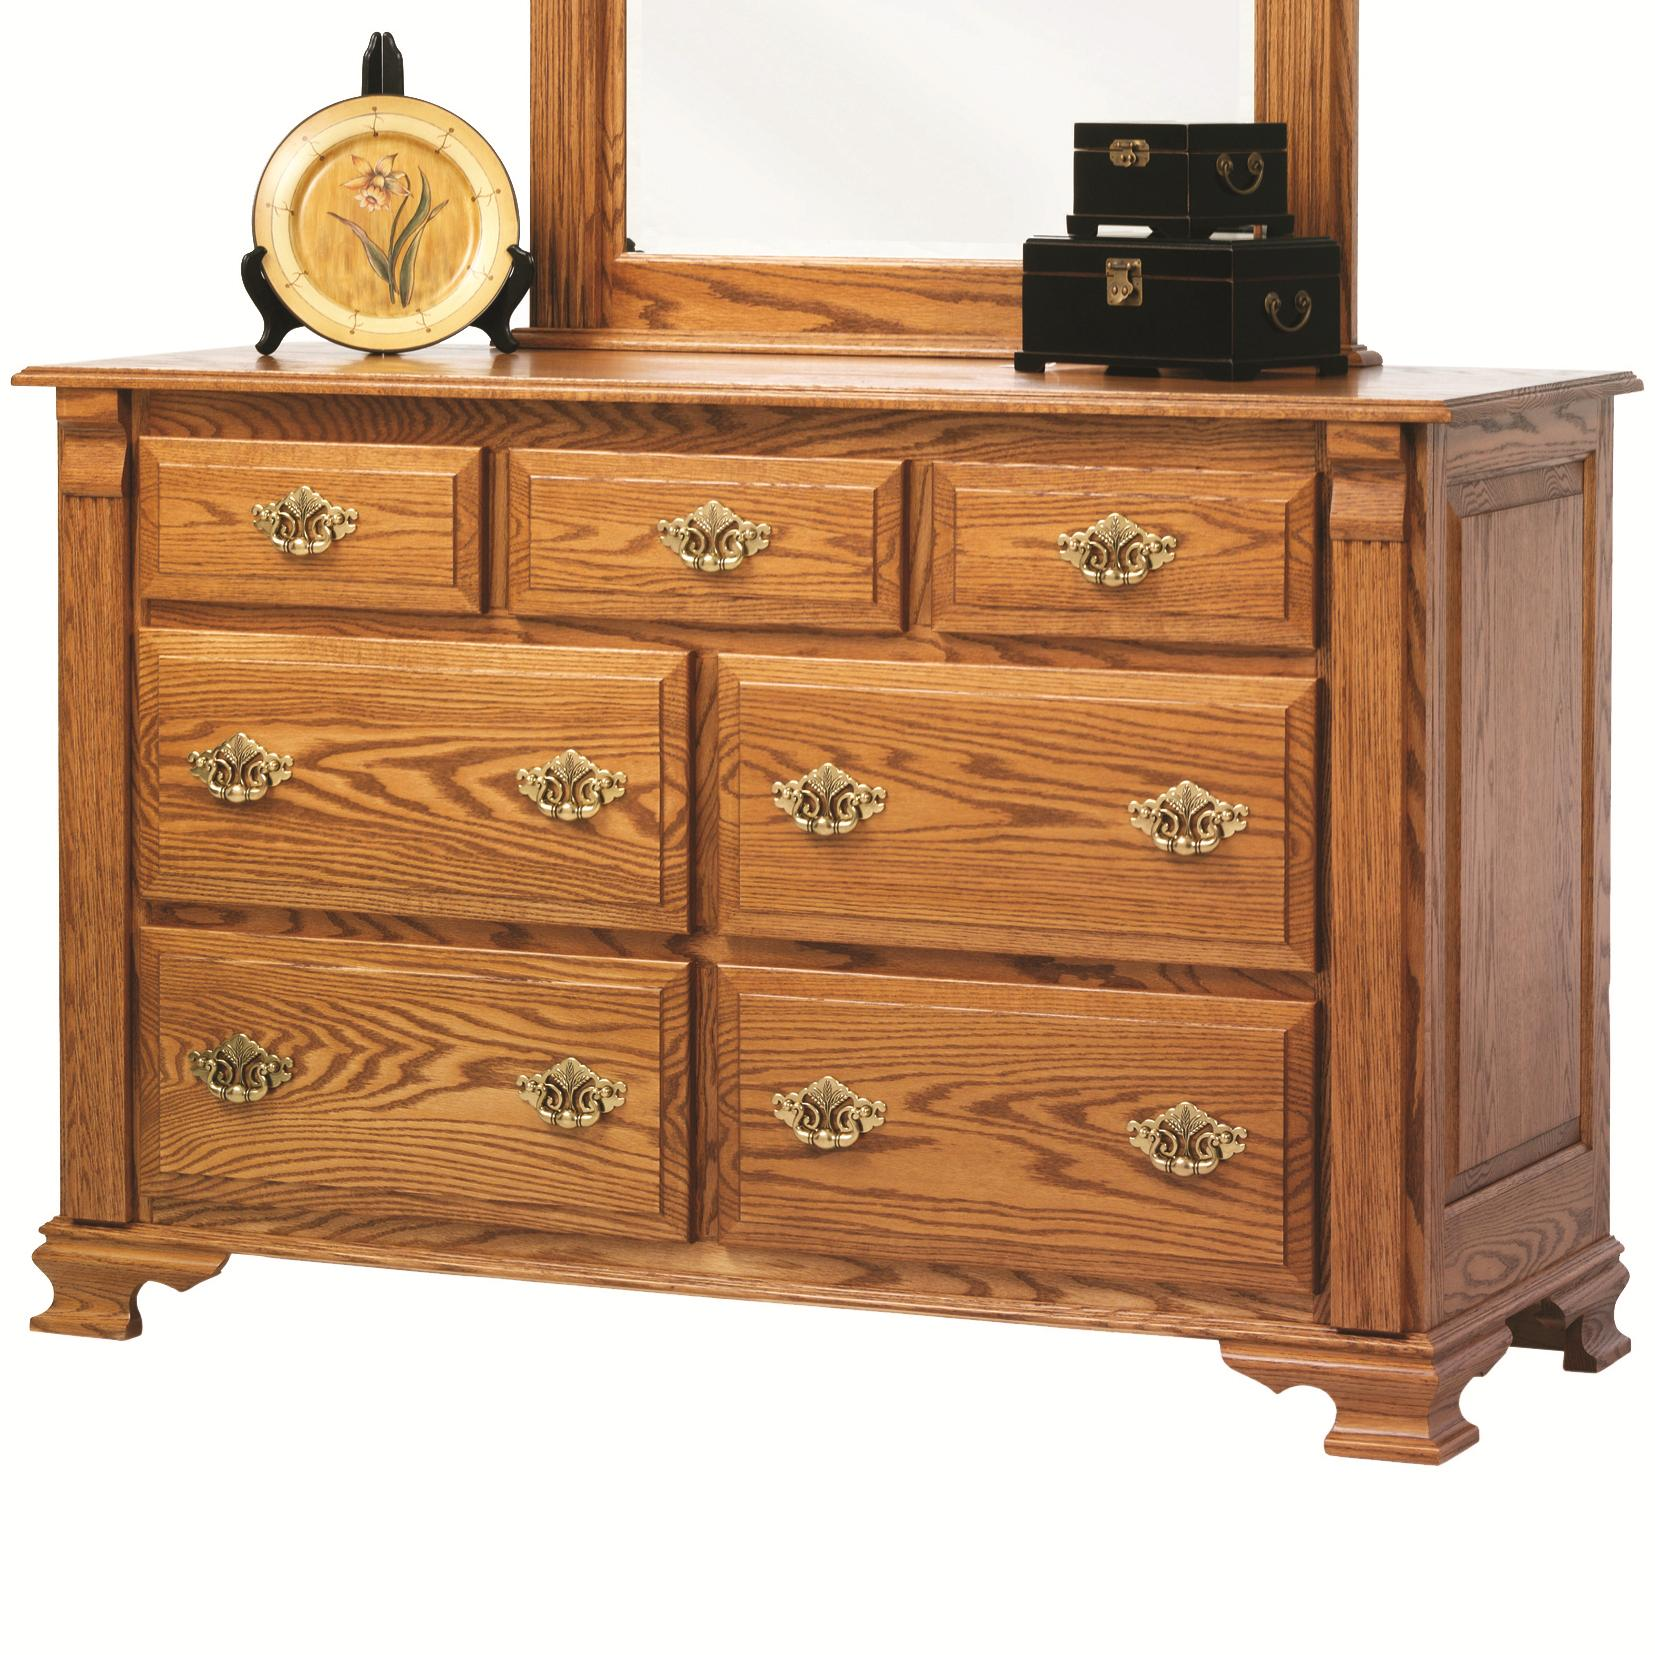 Journeys End Dresser by Millcraft at Saugerties Furniture Mart